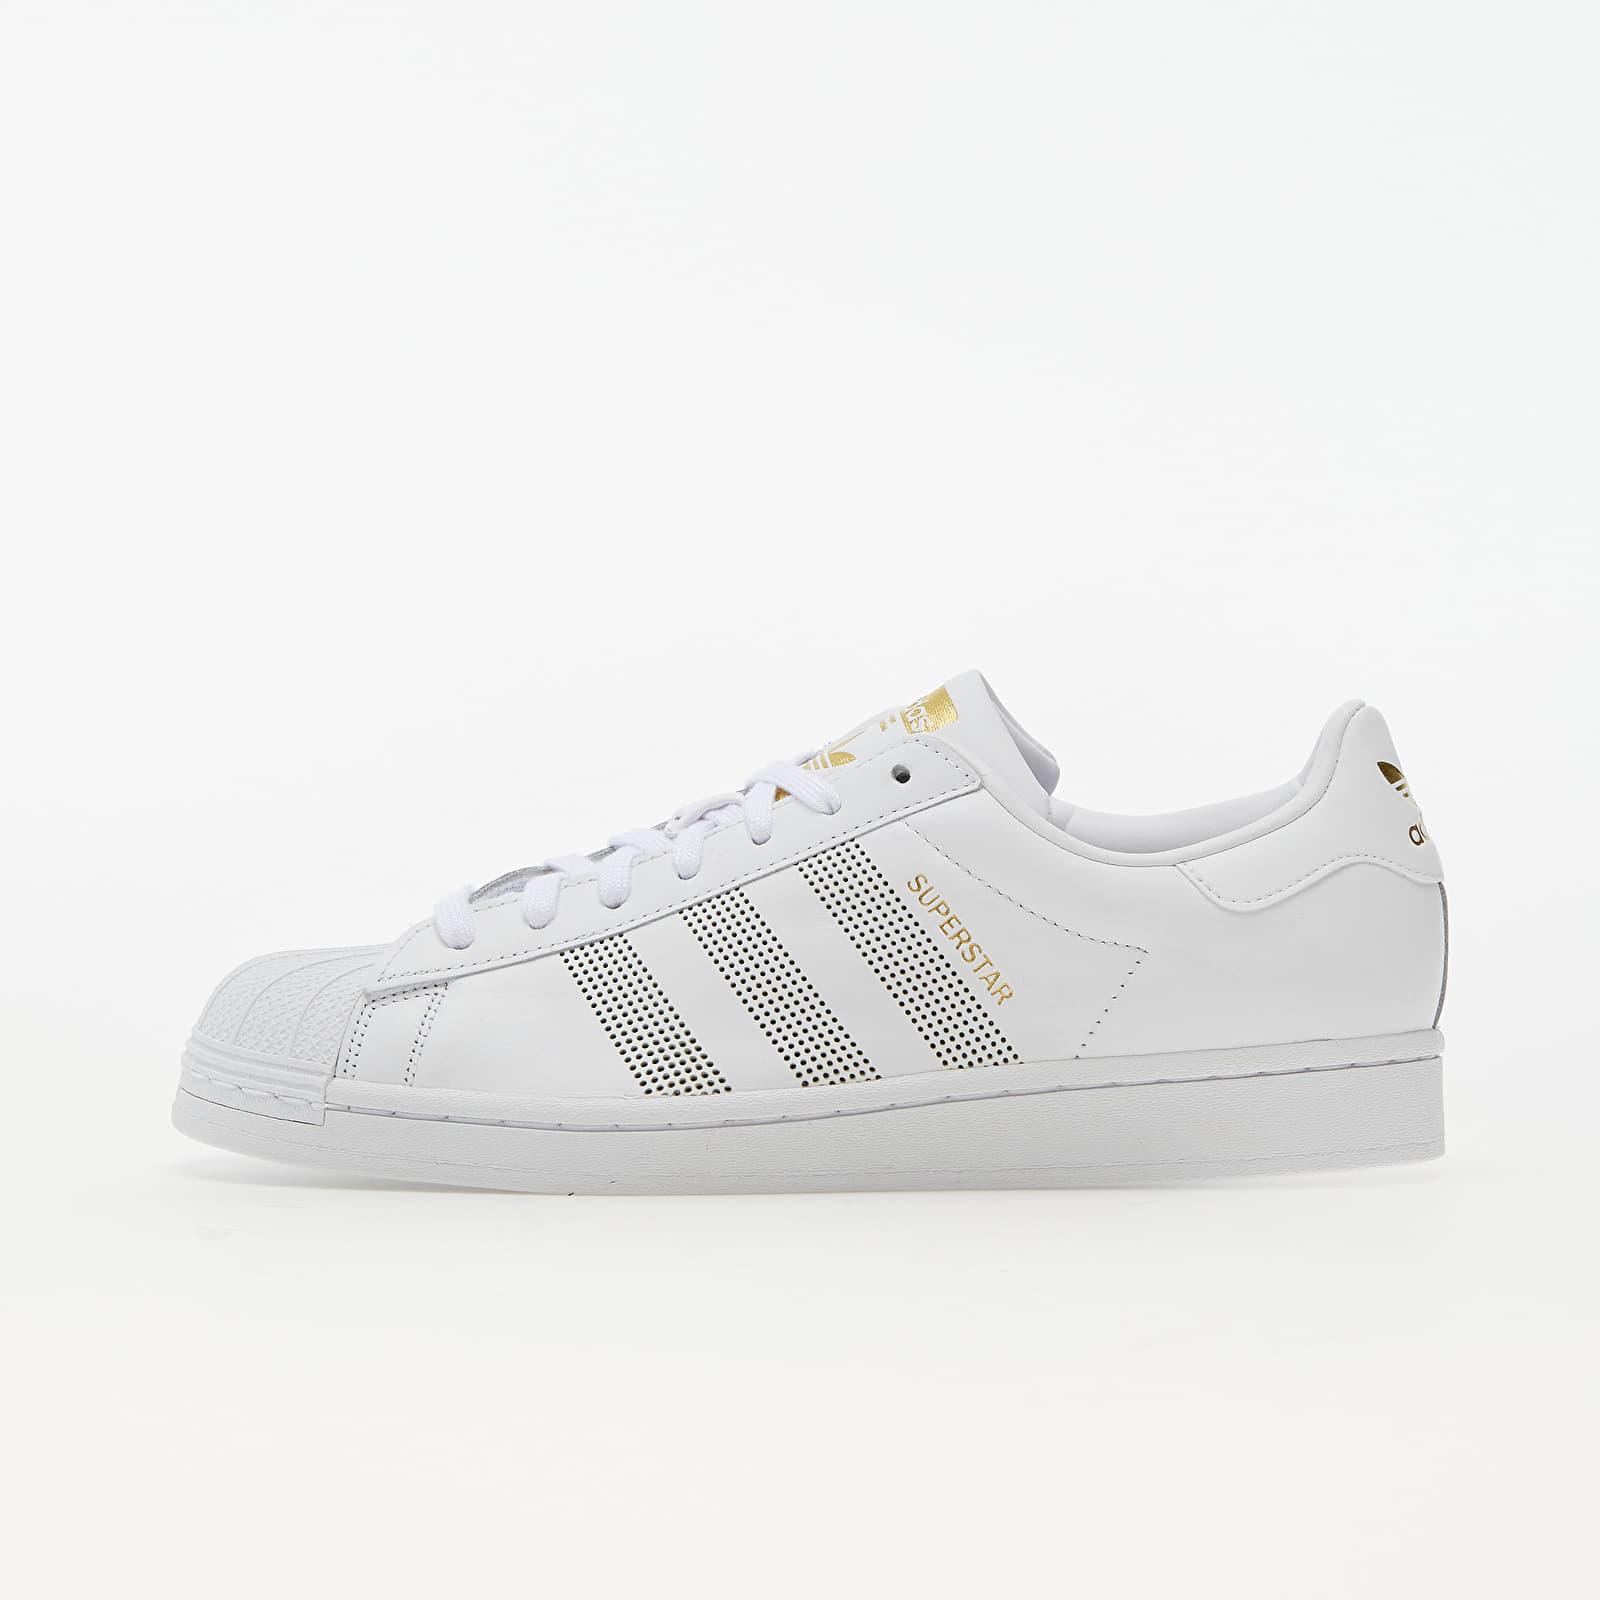 adidas Superstar Ftw White/ Ftw White/ Gold Metalic EUR 44